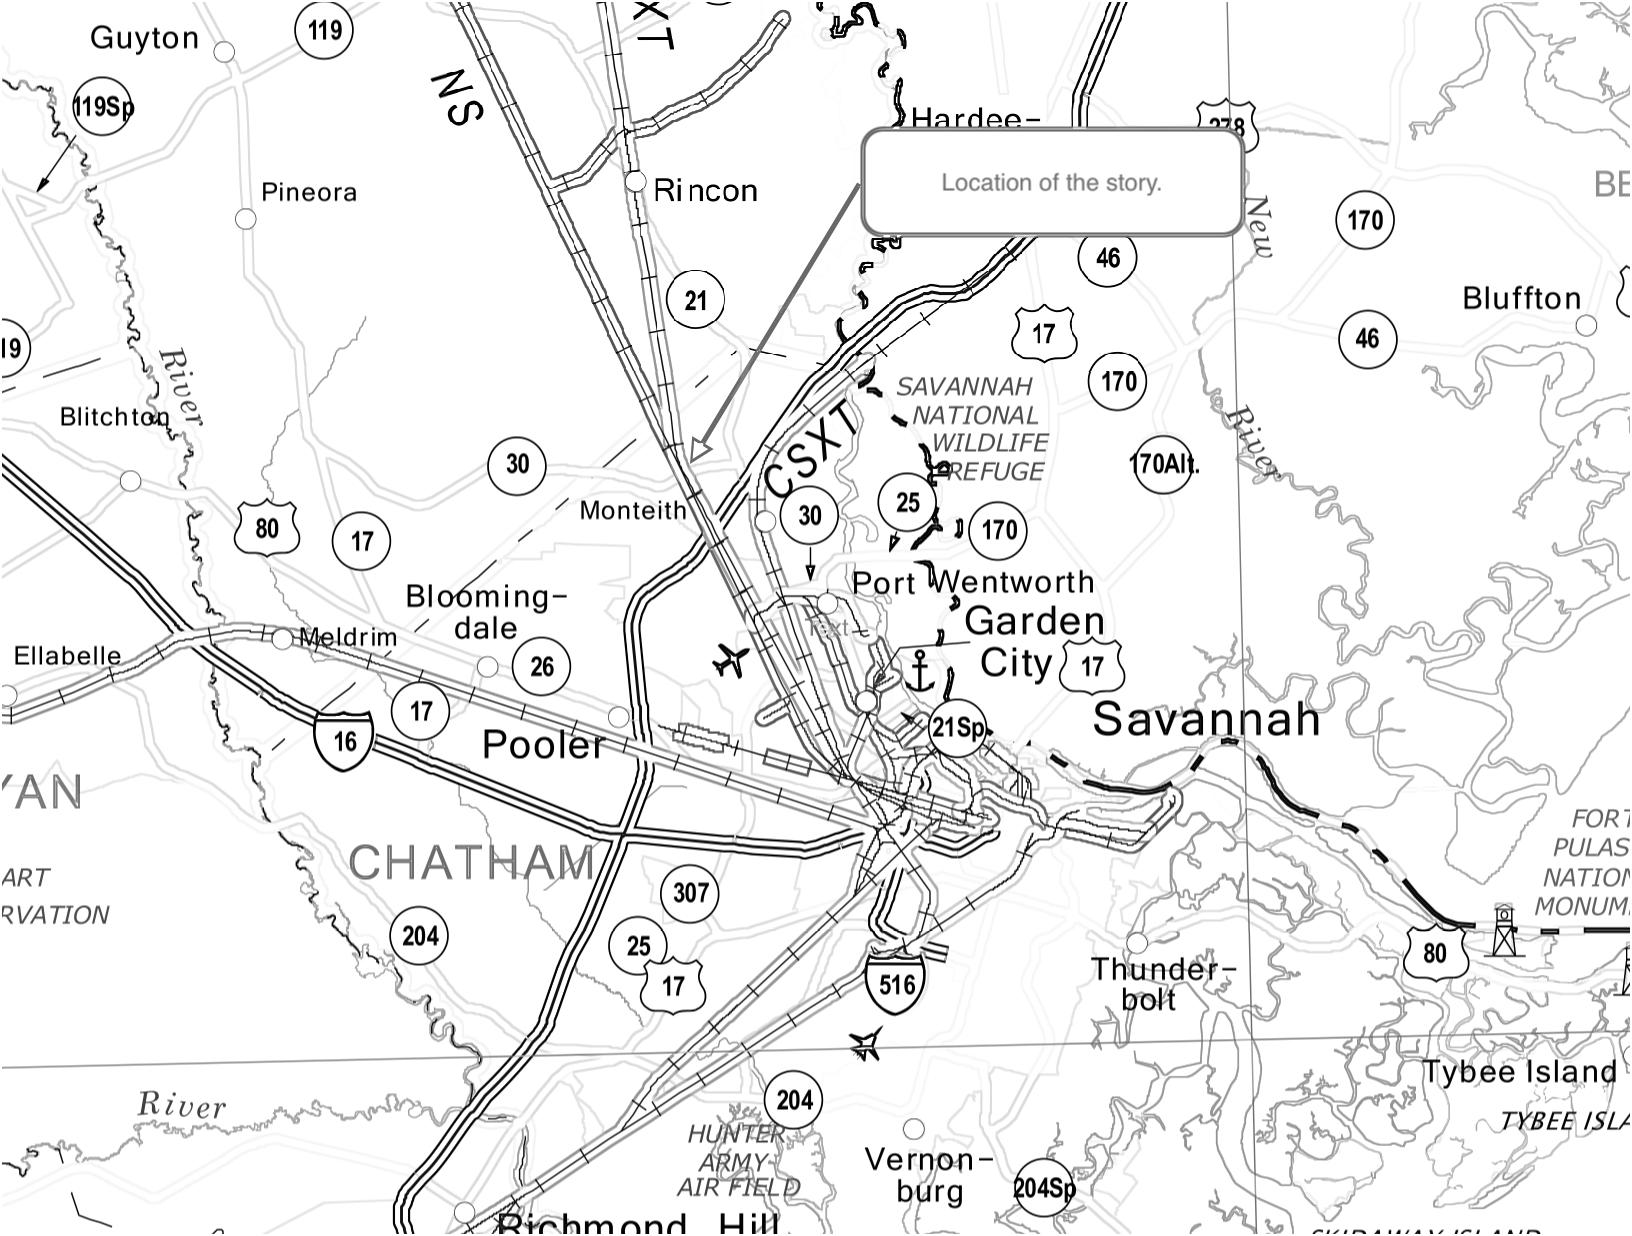 Source: Georgia Department of Transportation (http://www.dot.ga.gov/IS/Rail)